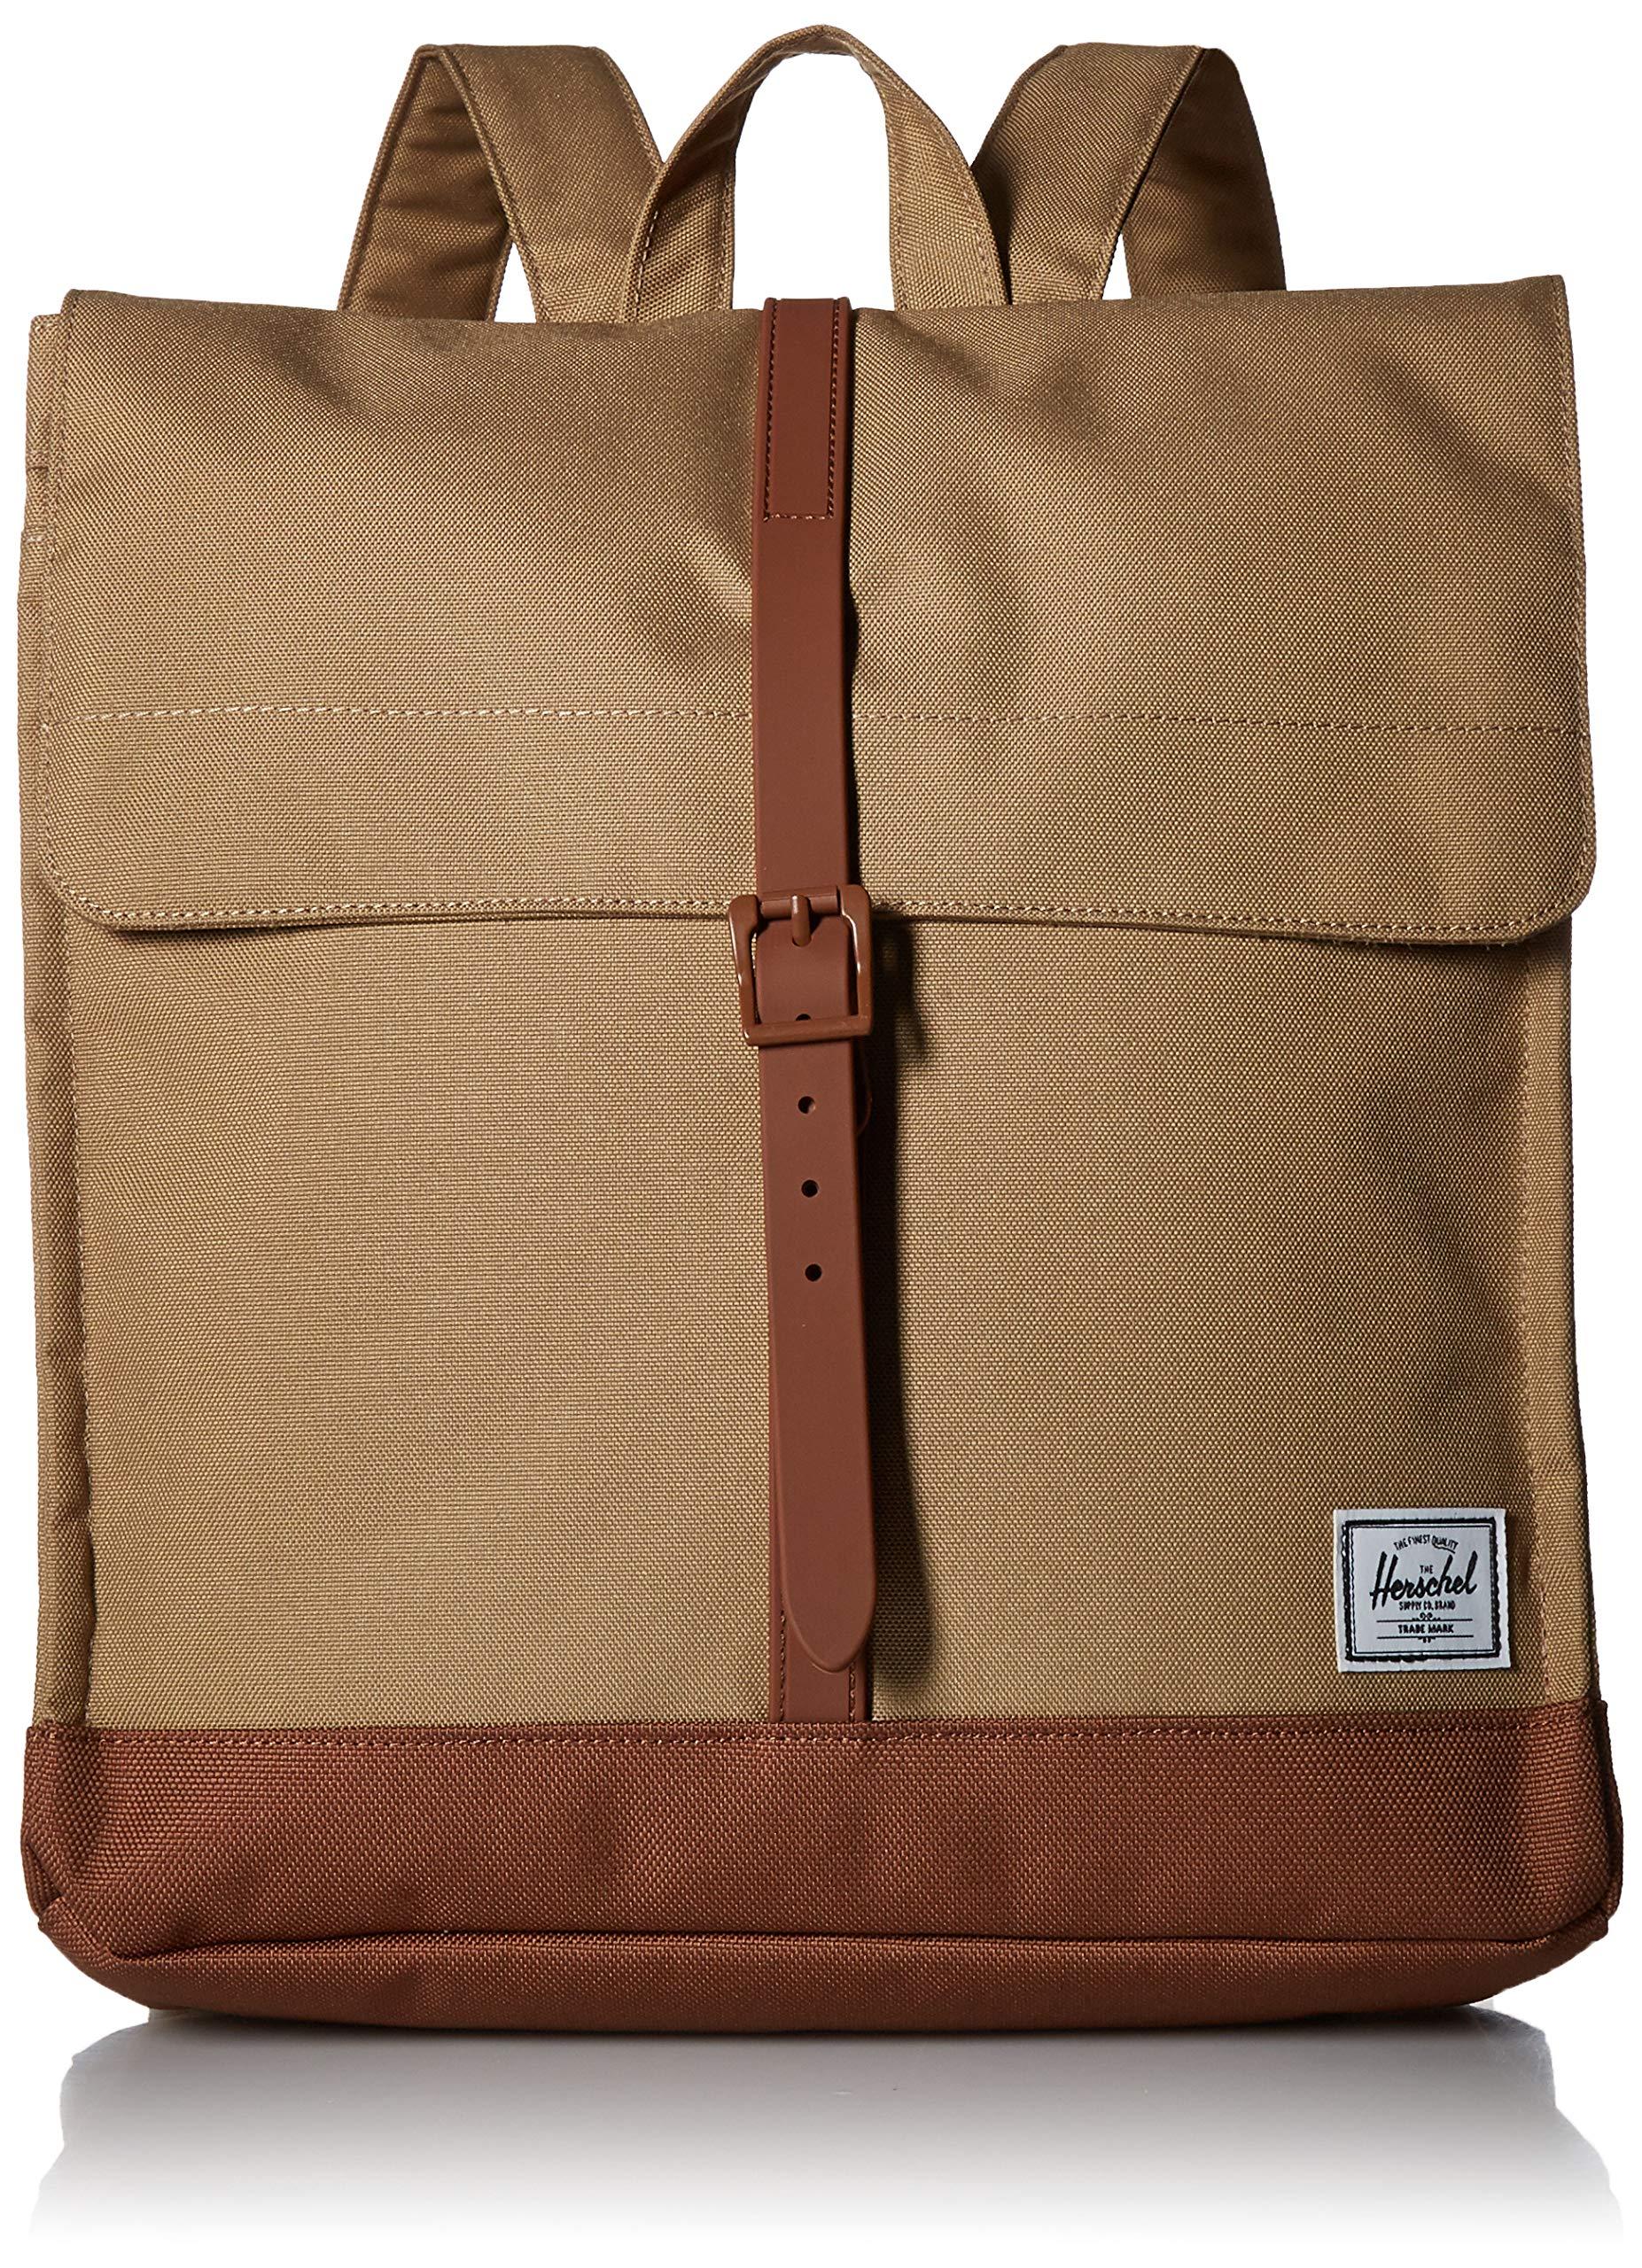 Herschel City Mid-Volume Backpack Kelp/Saddle Brown One Size